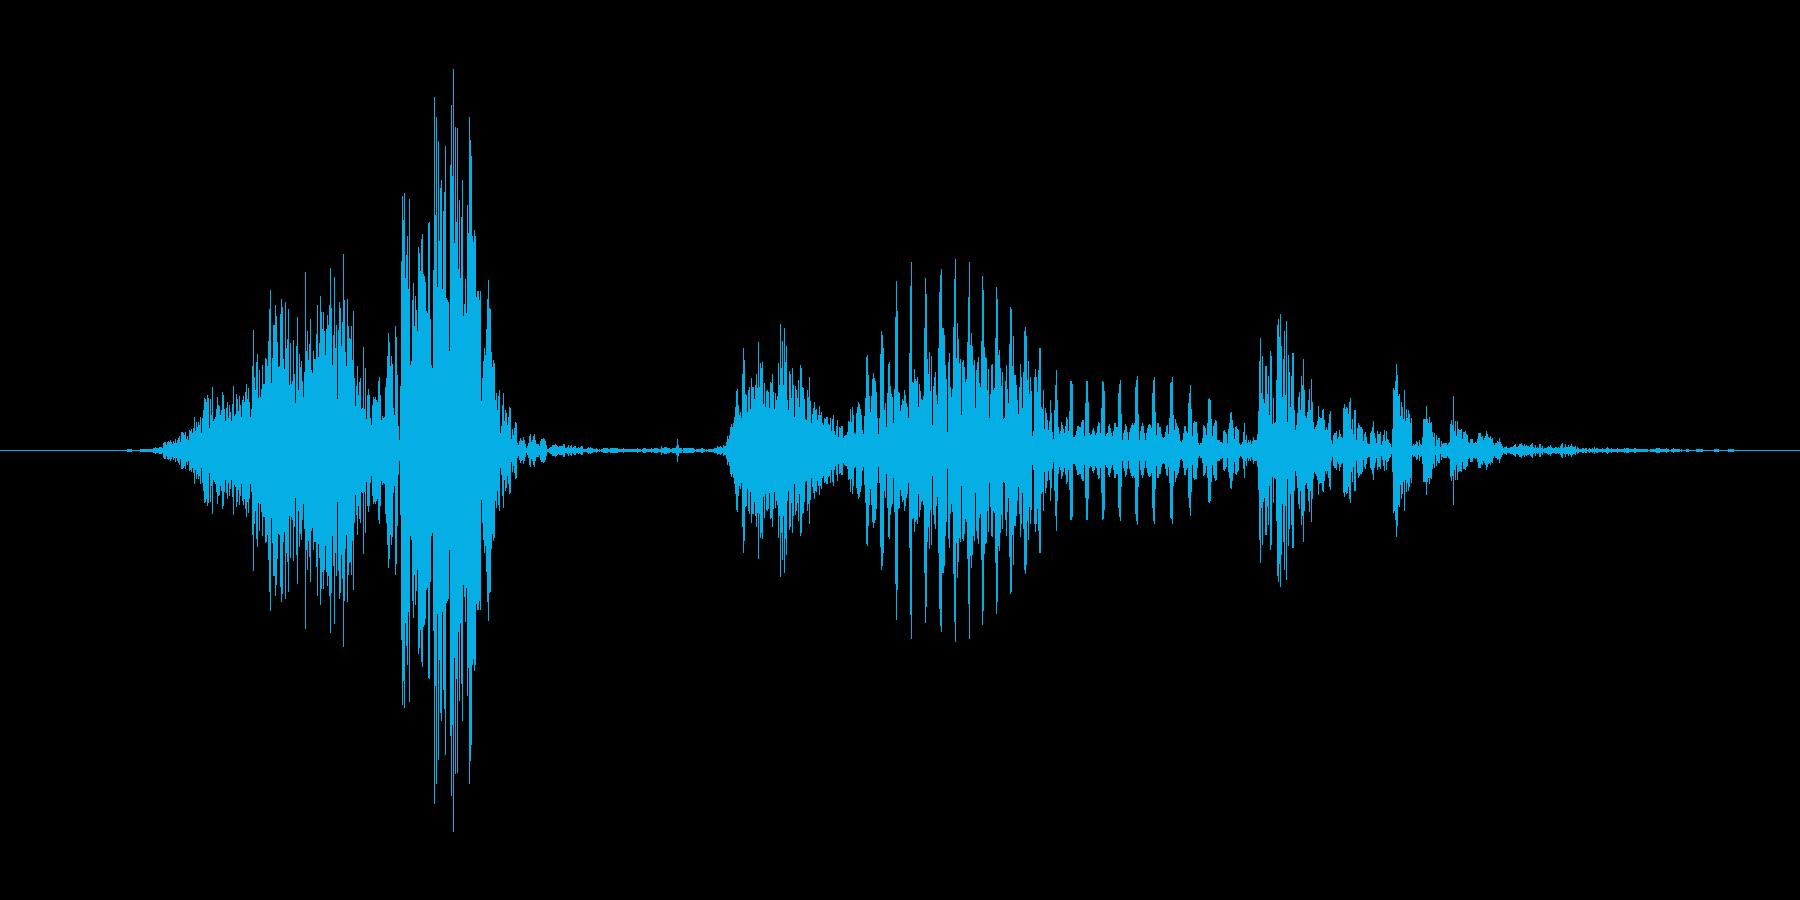 「September」英語発音の再生済みの波形